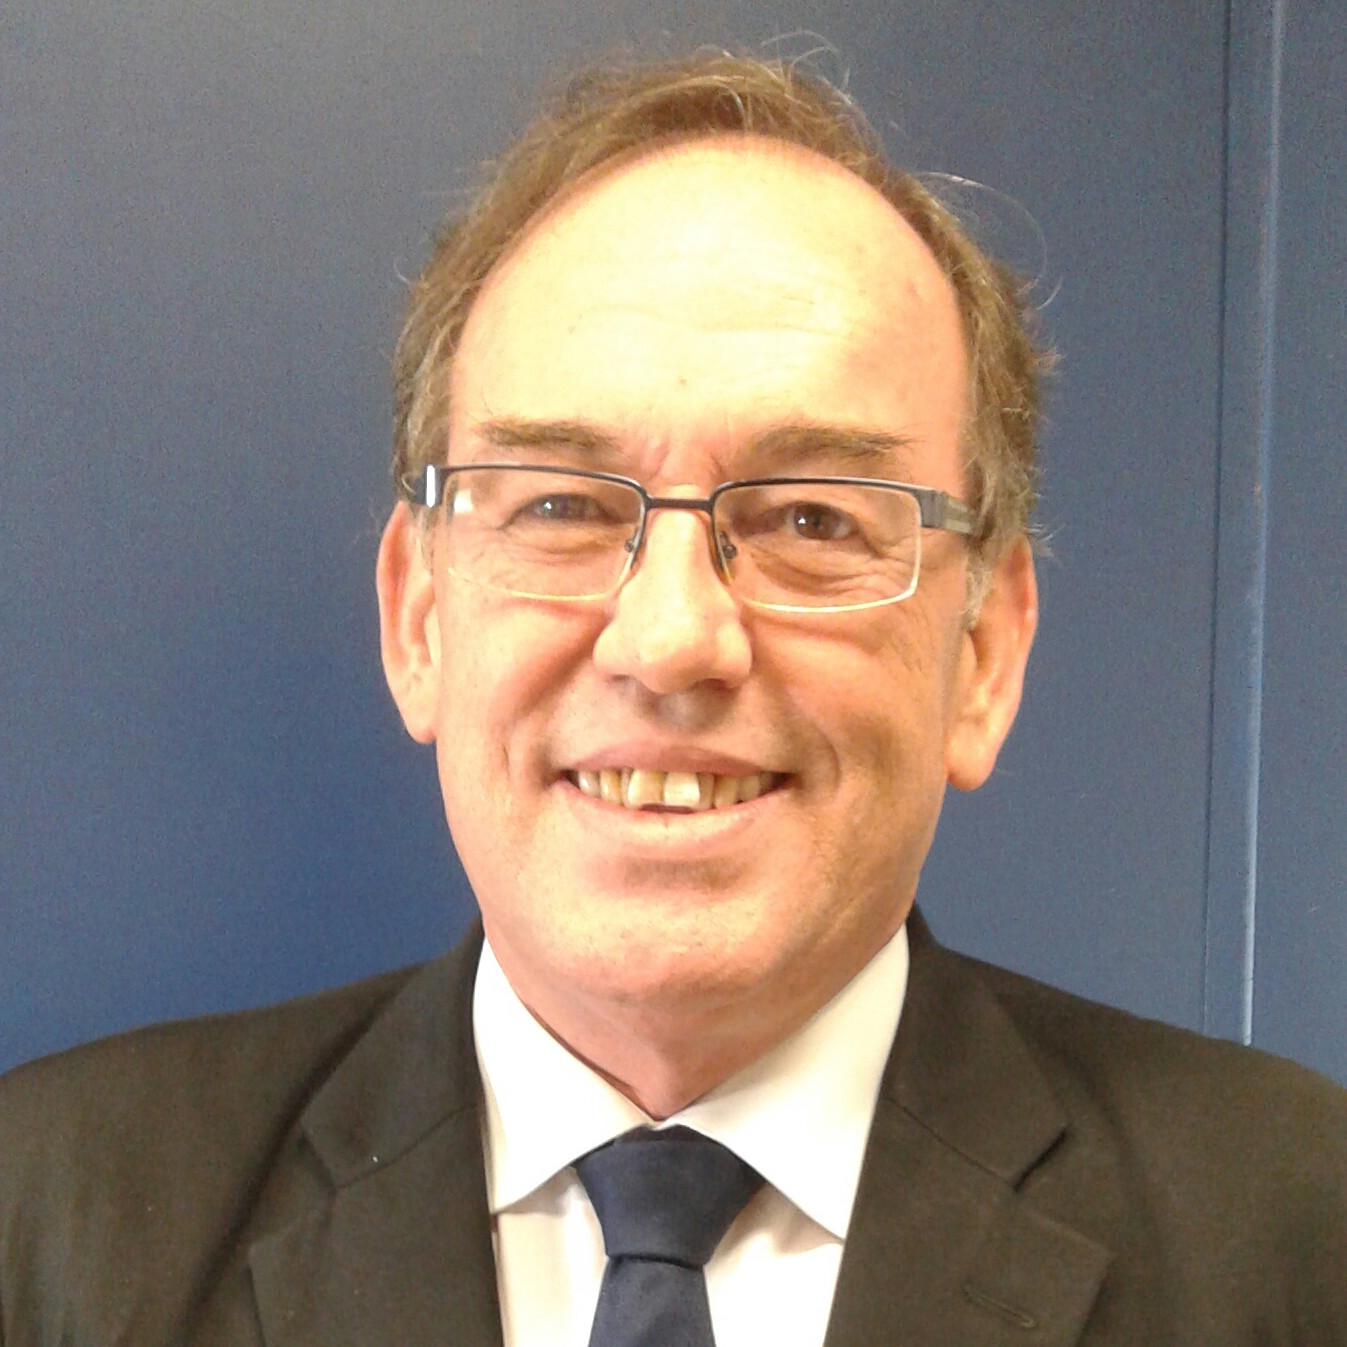 Juan Rafael Muñoiz